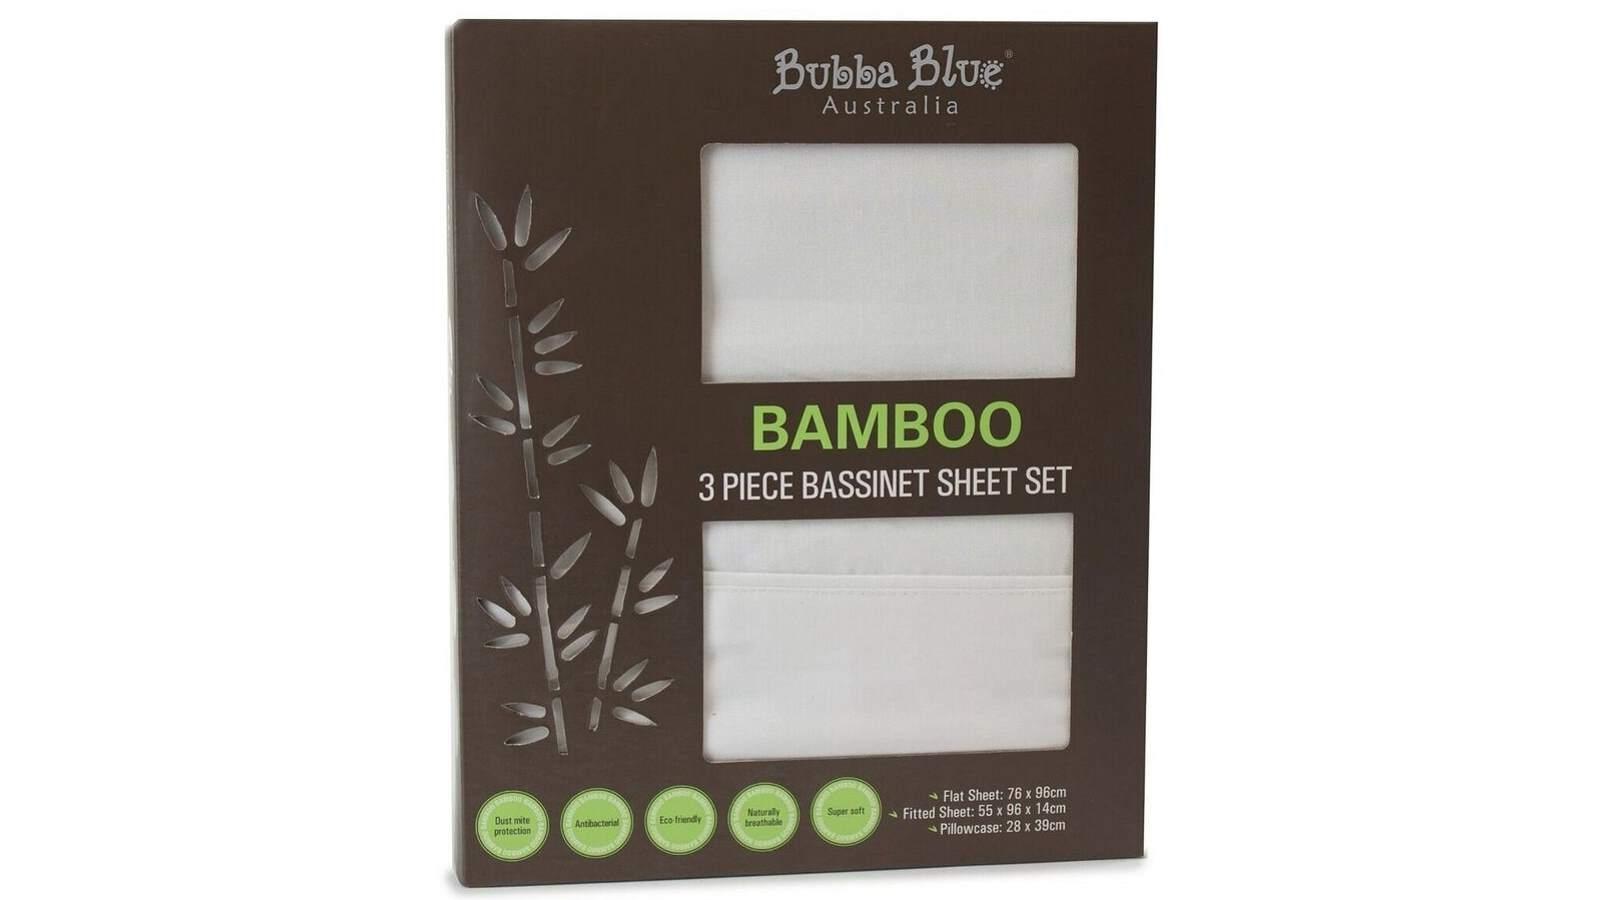 Image of Bubba Blue Bamboo 3 Piece Bassinet Sheet Set - White